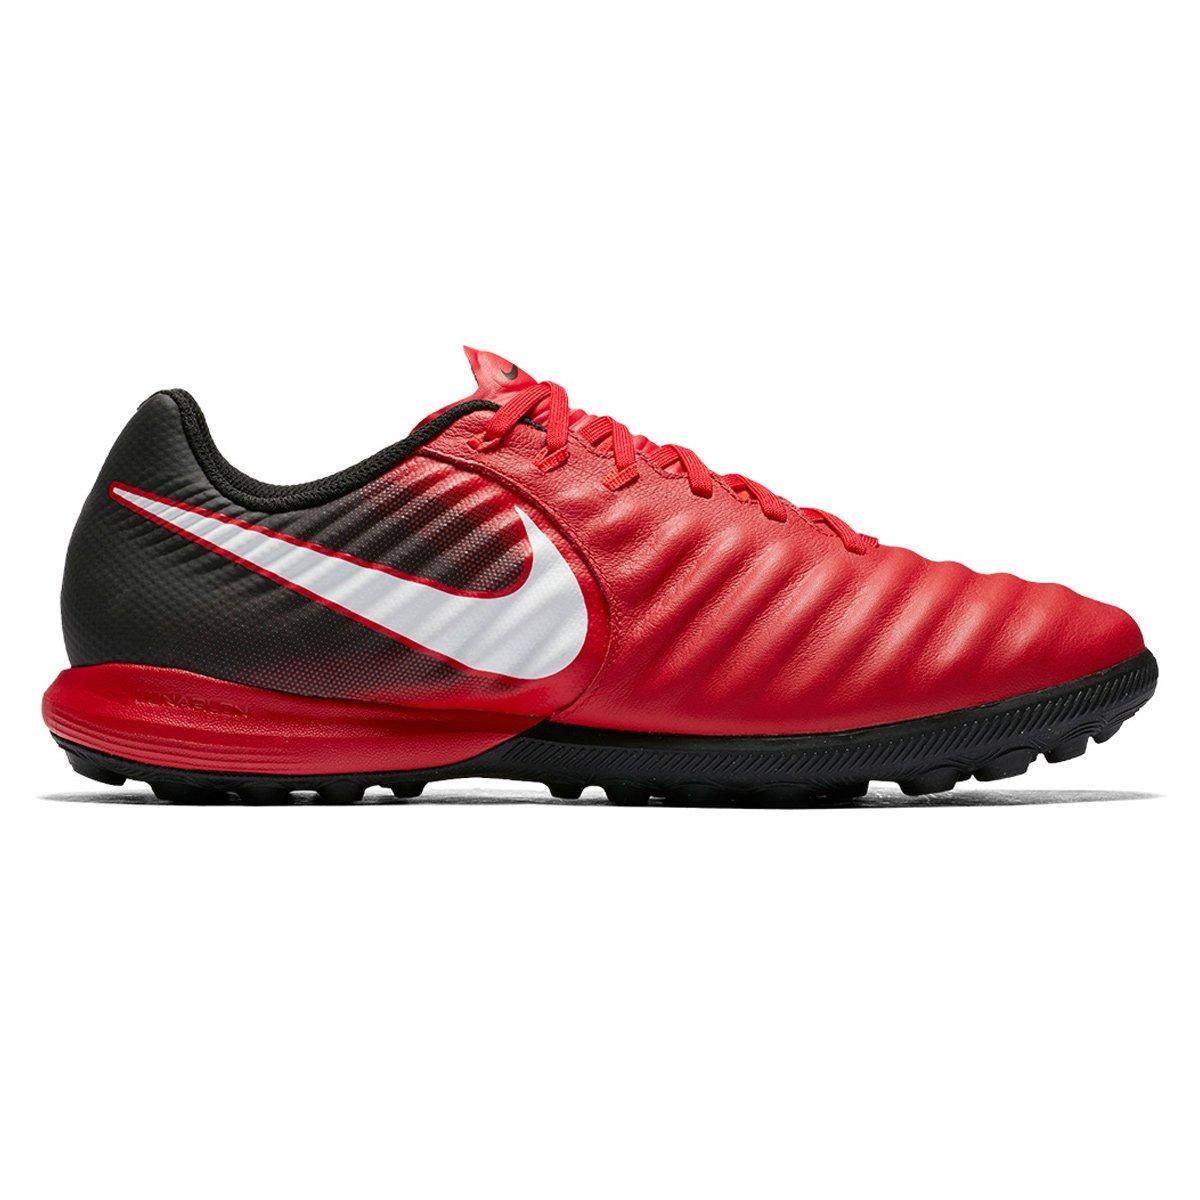 eaaea0b552d68 Chuteira Society Nike Tiempo Finale TF - Vermelho e Branco - Compre Agora